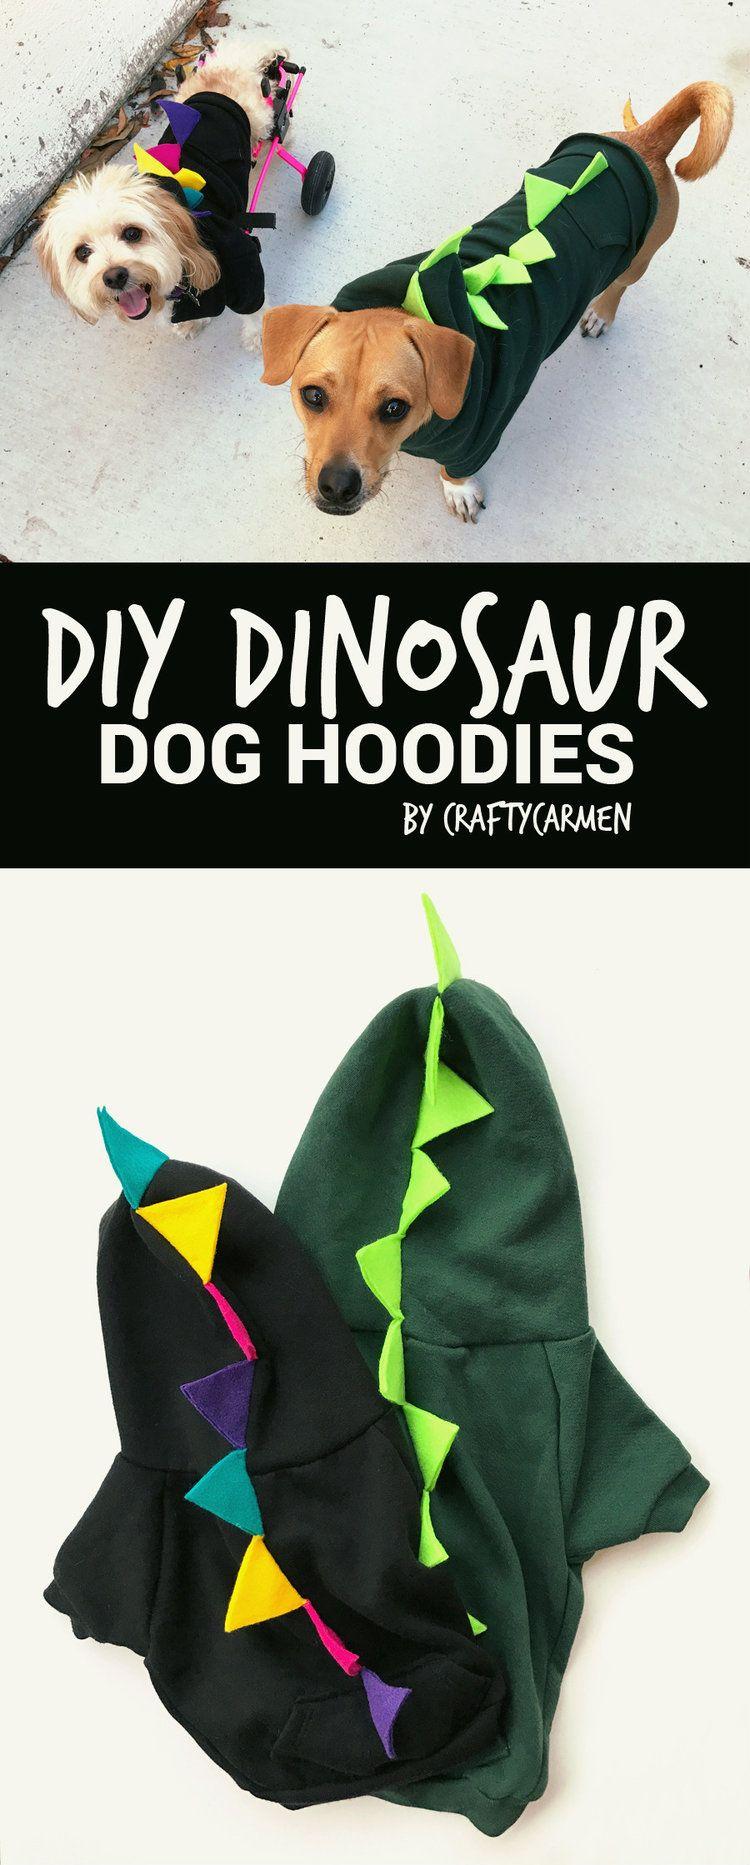 Diy Dinosaur Dog Hoodies Diy Dog Costumes Dog Dinosaur Costume